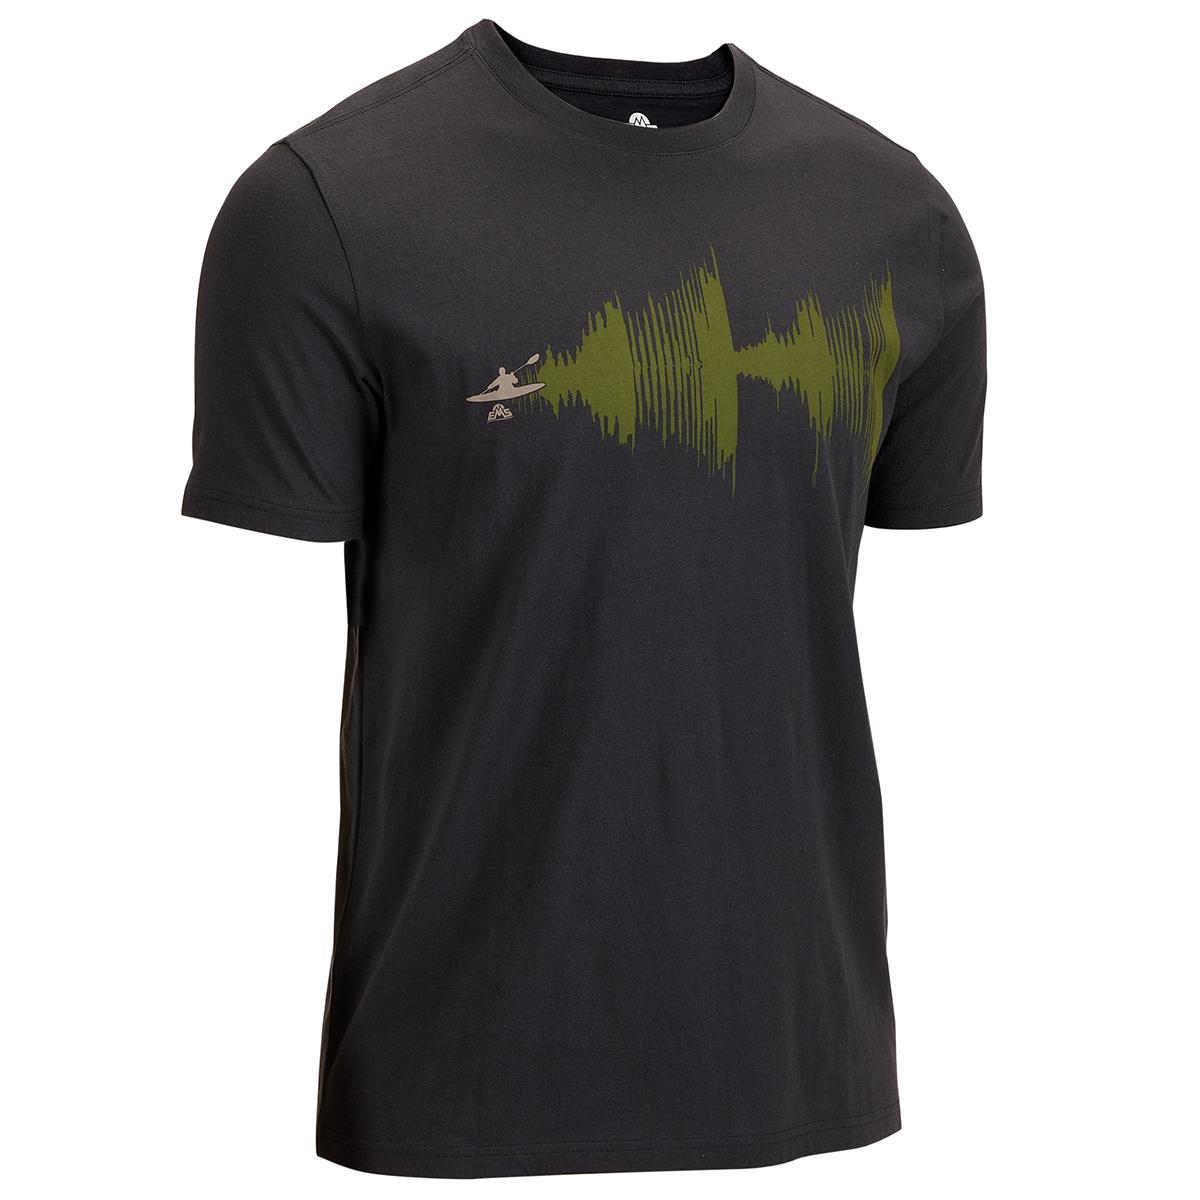 Ems Men's Short-Sleeve Graphic Tee - Black, M